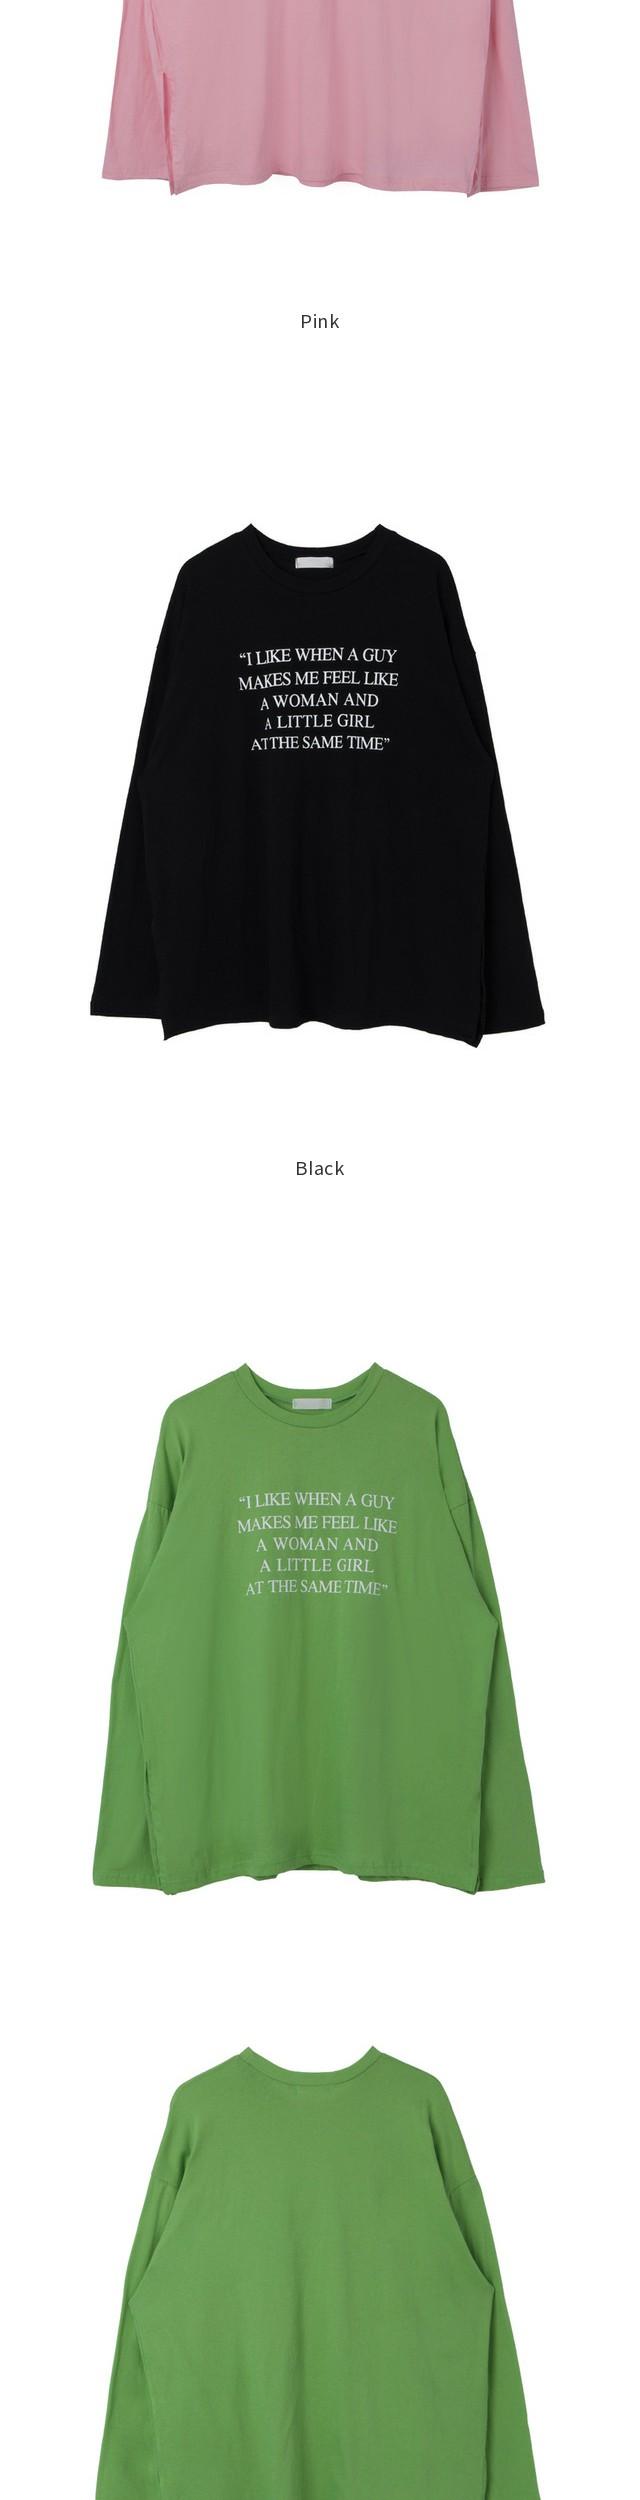 Meloslab T-shirt